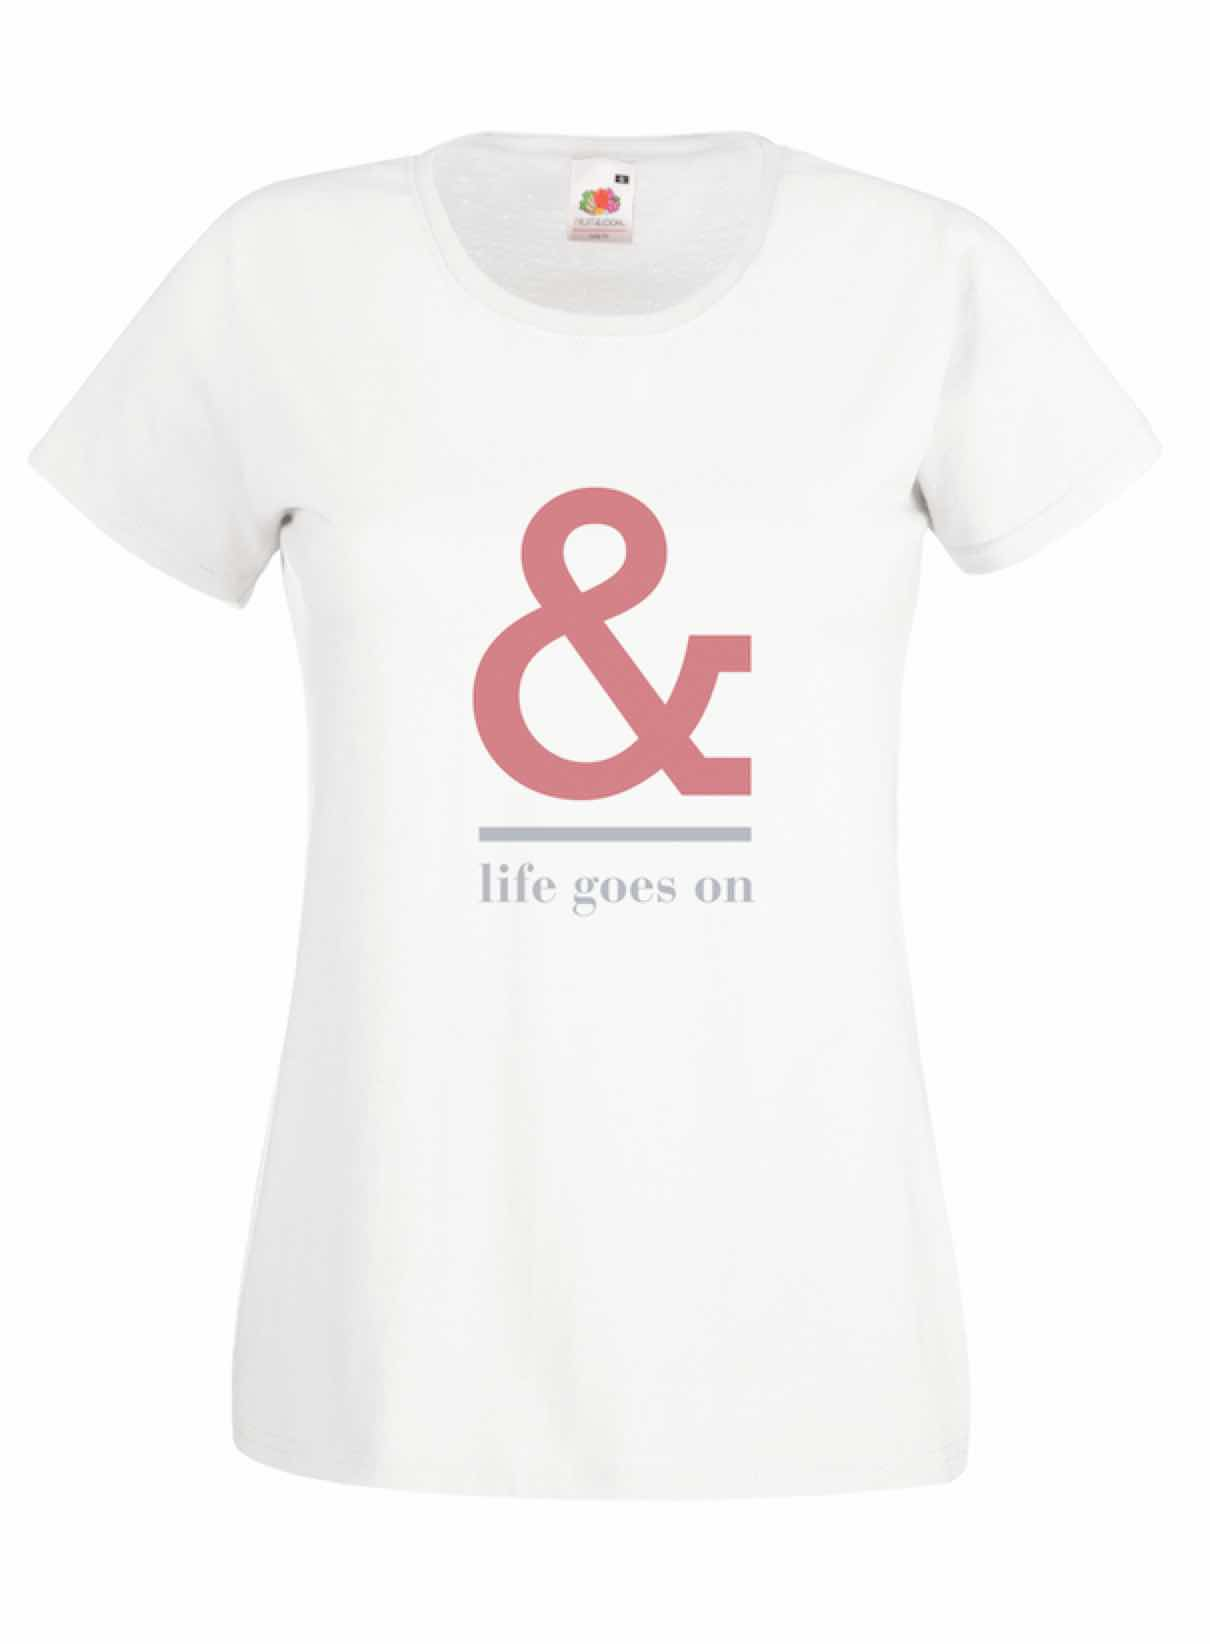 & Life Goes On design for t-shirt, hoodie & sweatshirt